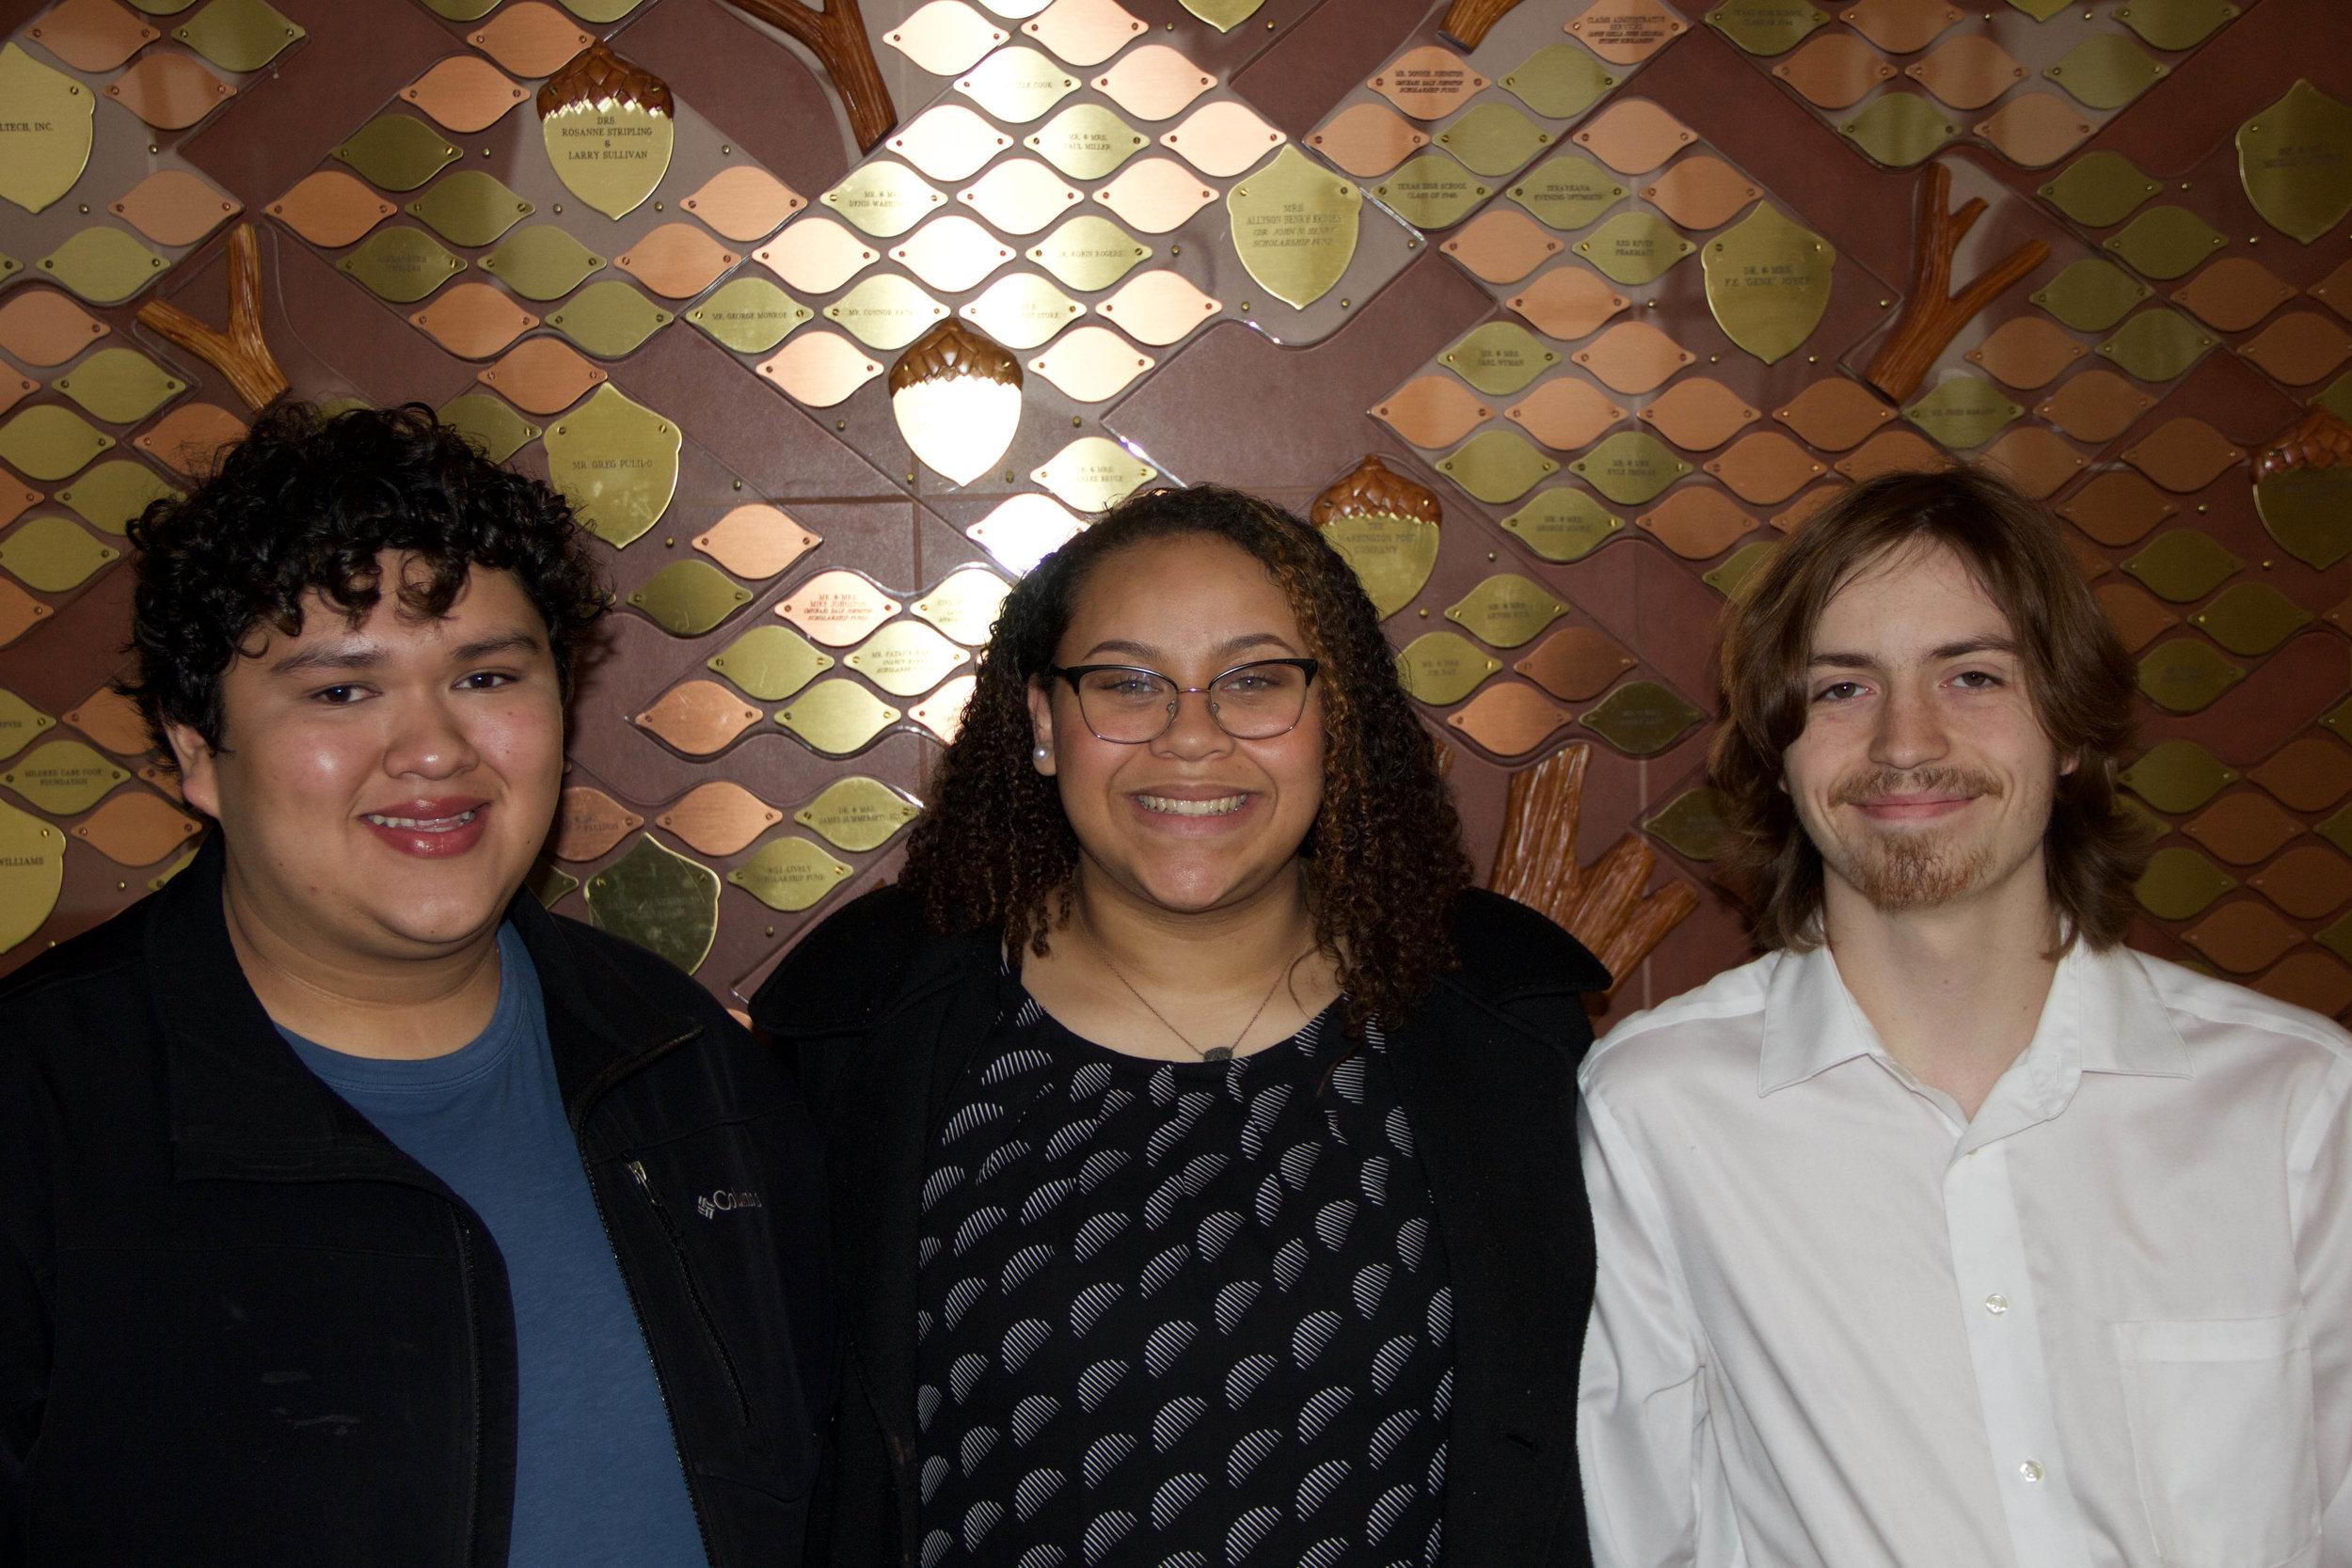 José Velasquez, Haley Jefferson and Caleb Dell